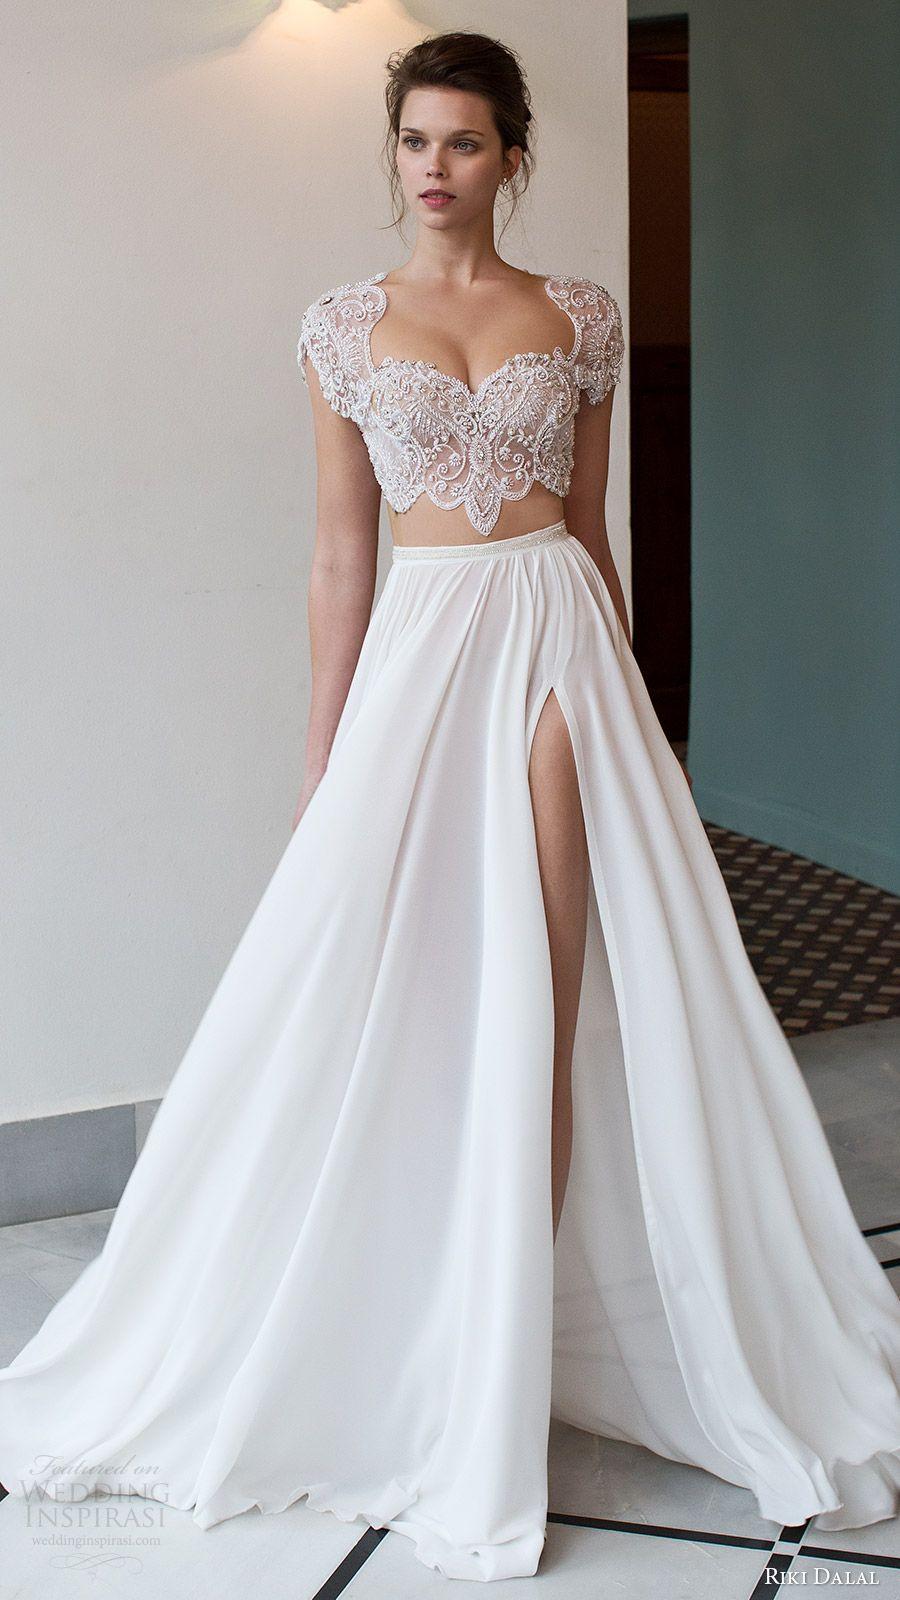 "Riki Dalal 2016 Wedding Dresses — ""Verona"" Bridal"